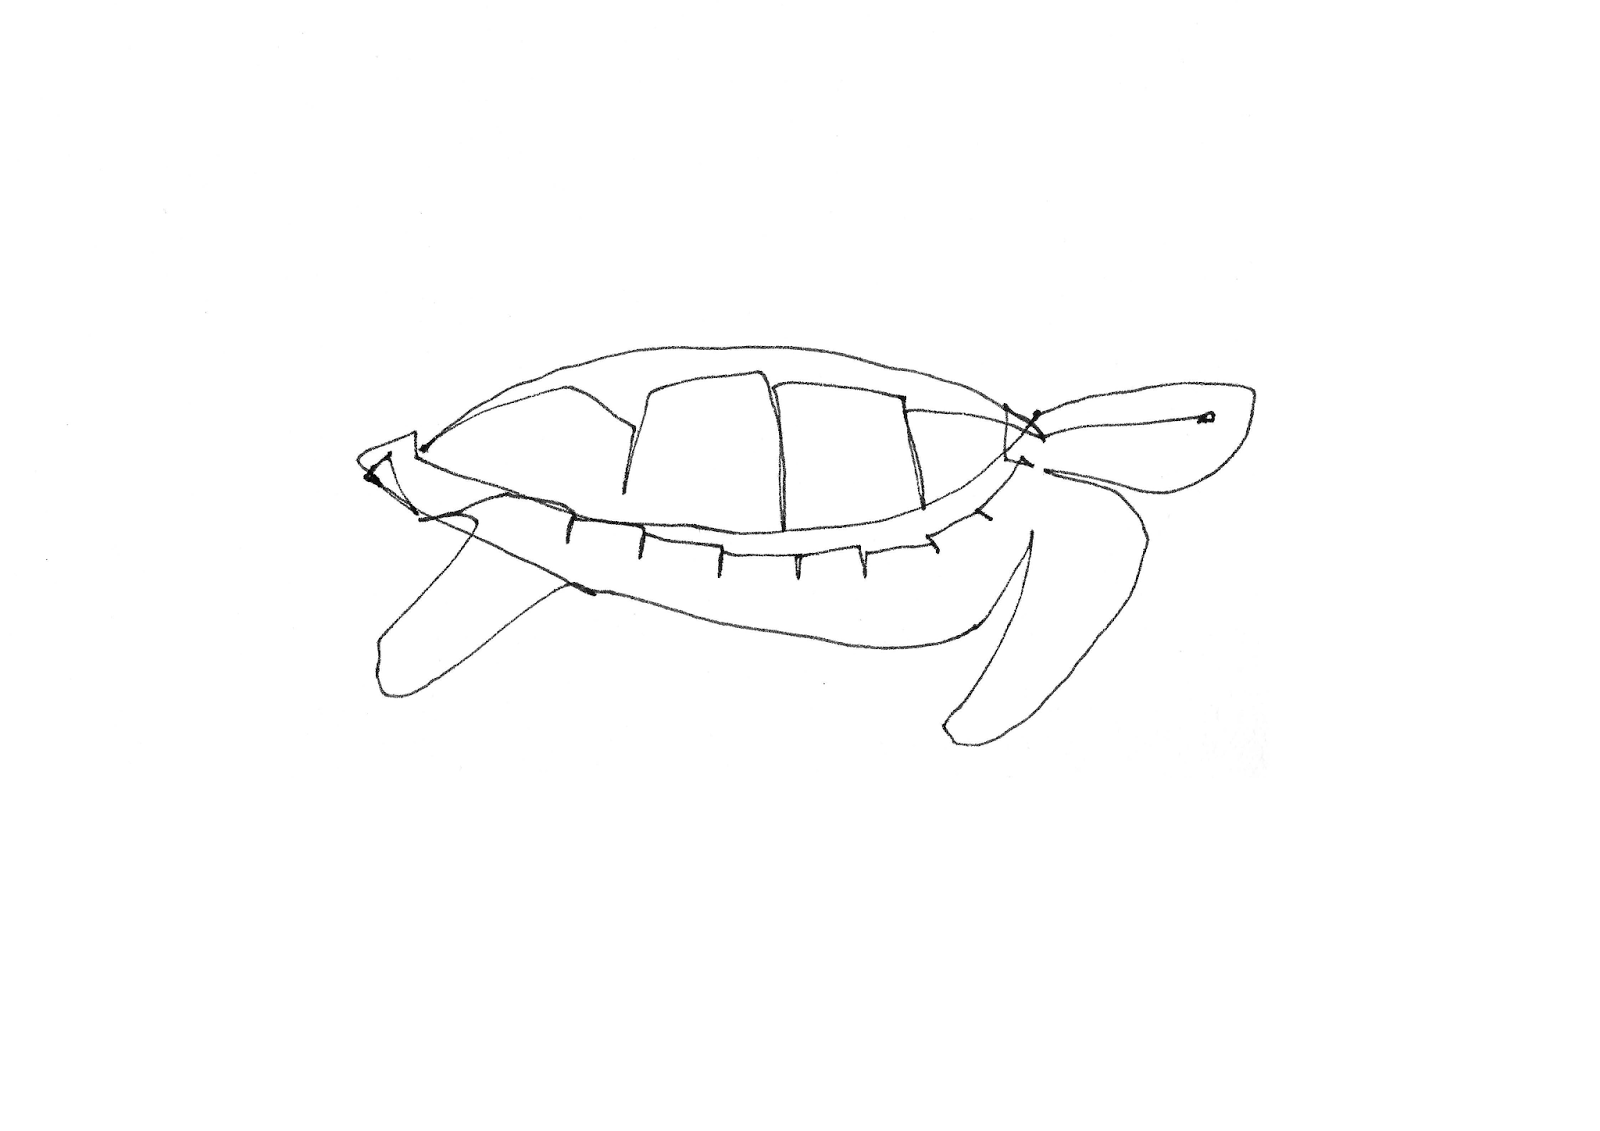 Line Drawing Turtle : Single line drawings turtles for tim